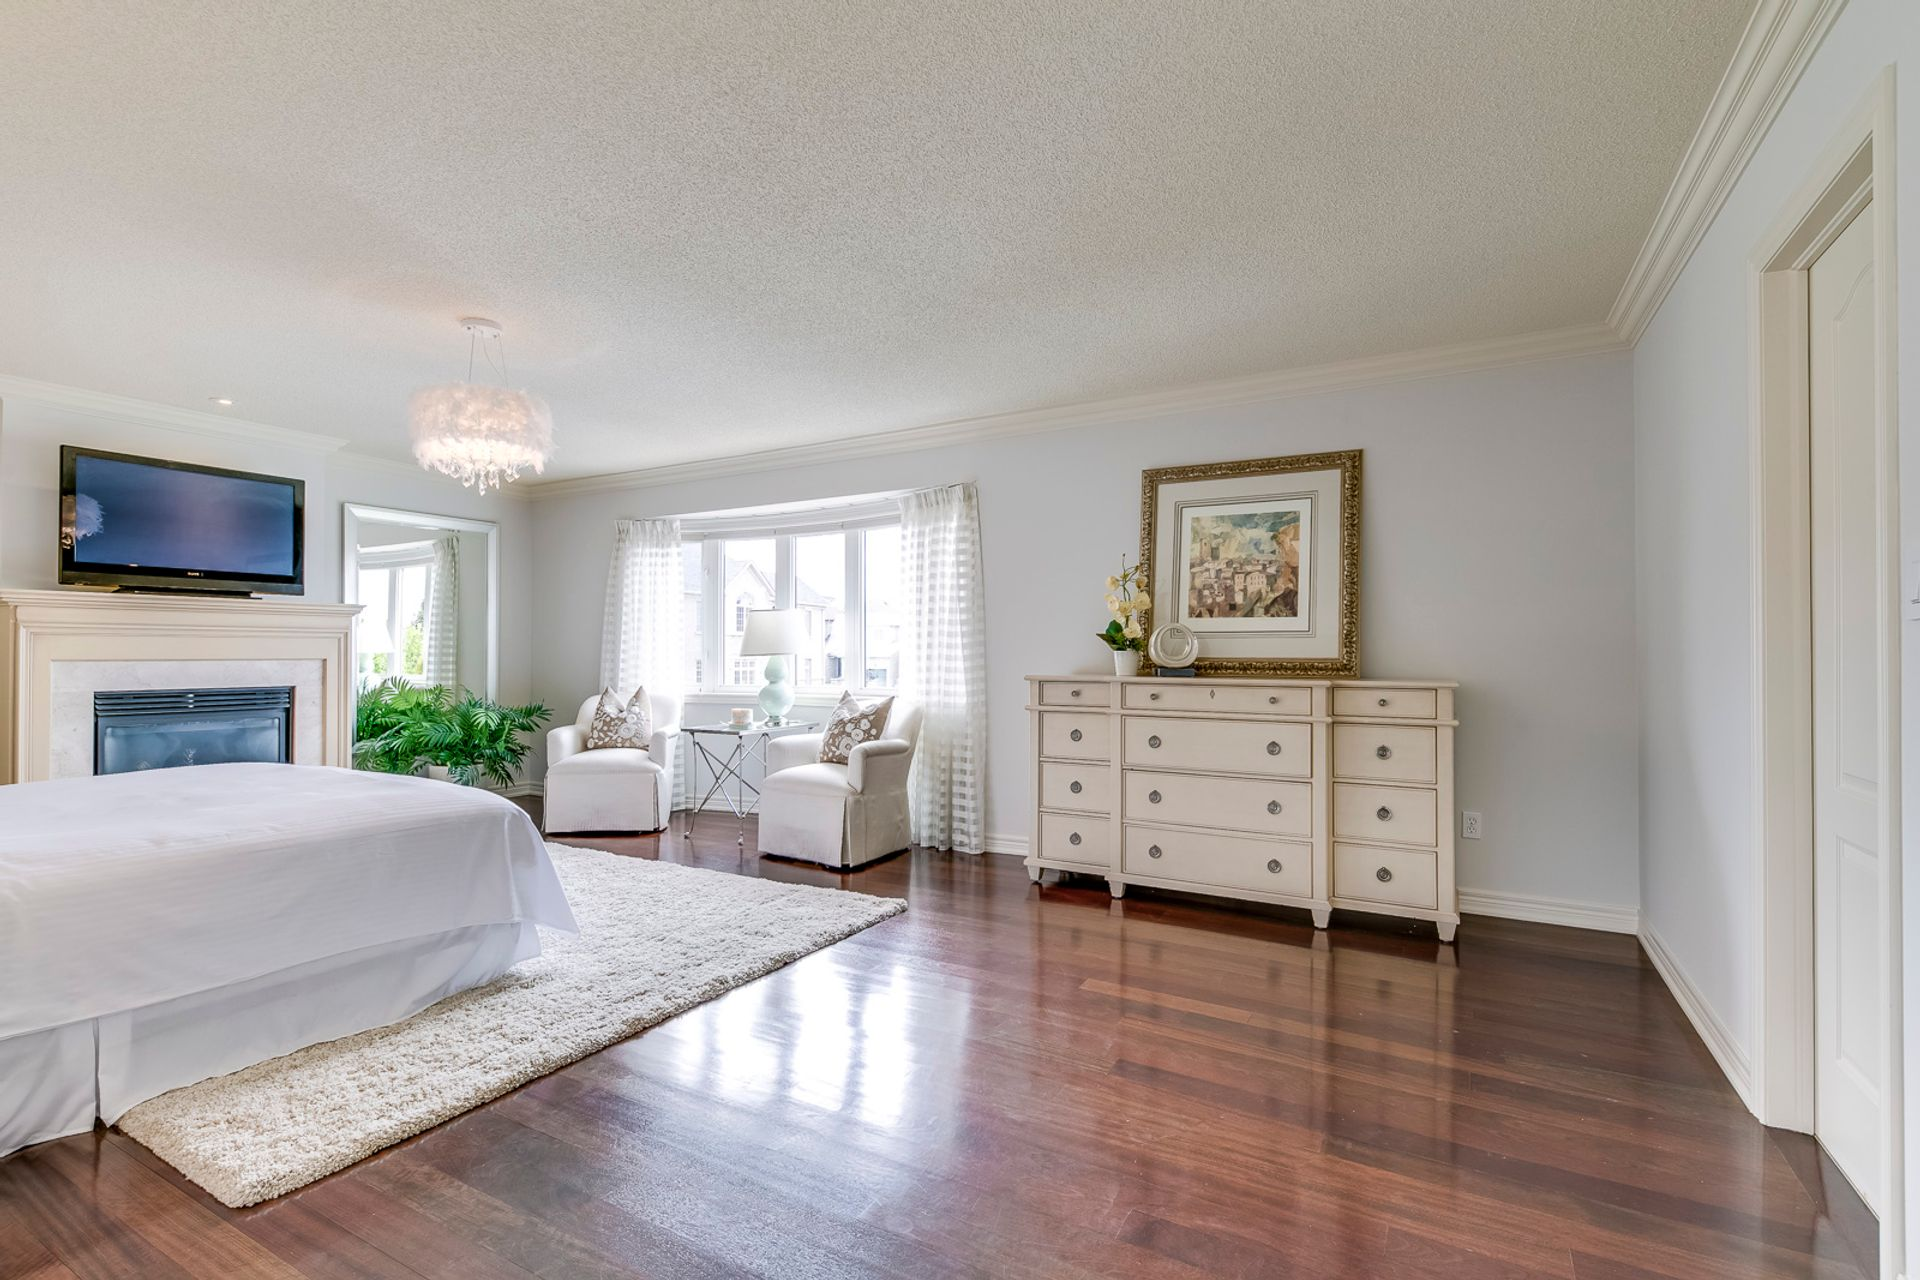 Master Bedroom - 2487 Bon Echo Dr, Oakville - Elite3 & Team at 2487 Bon Echo Drive, Iroquois Ridge North, Oakville